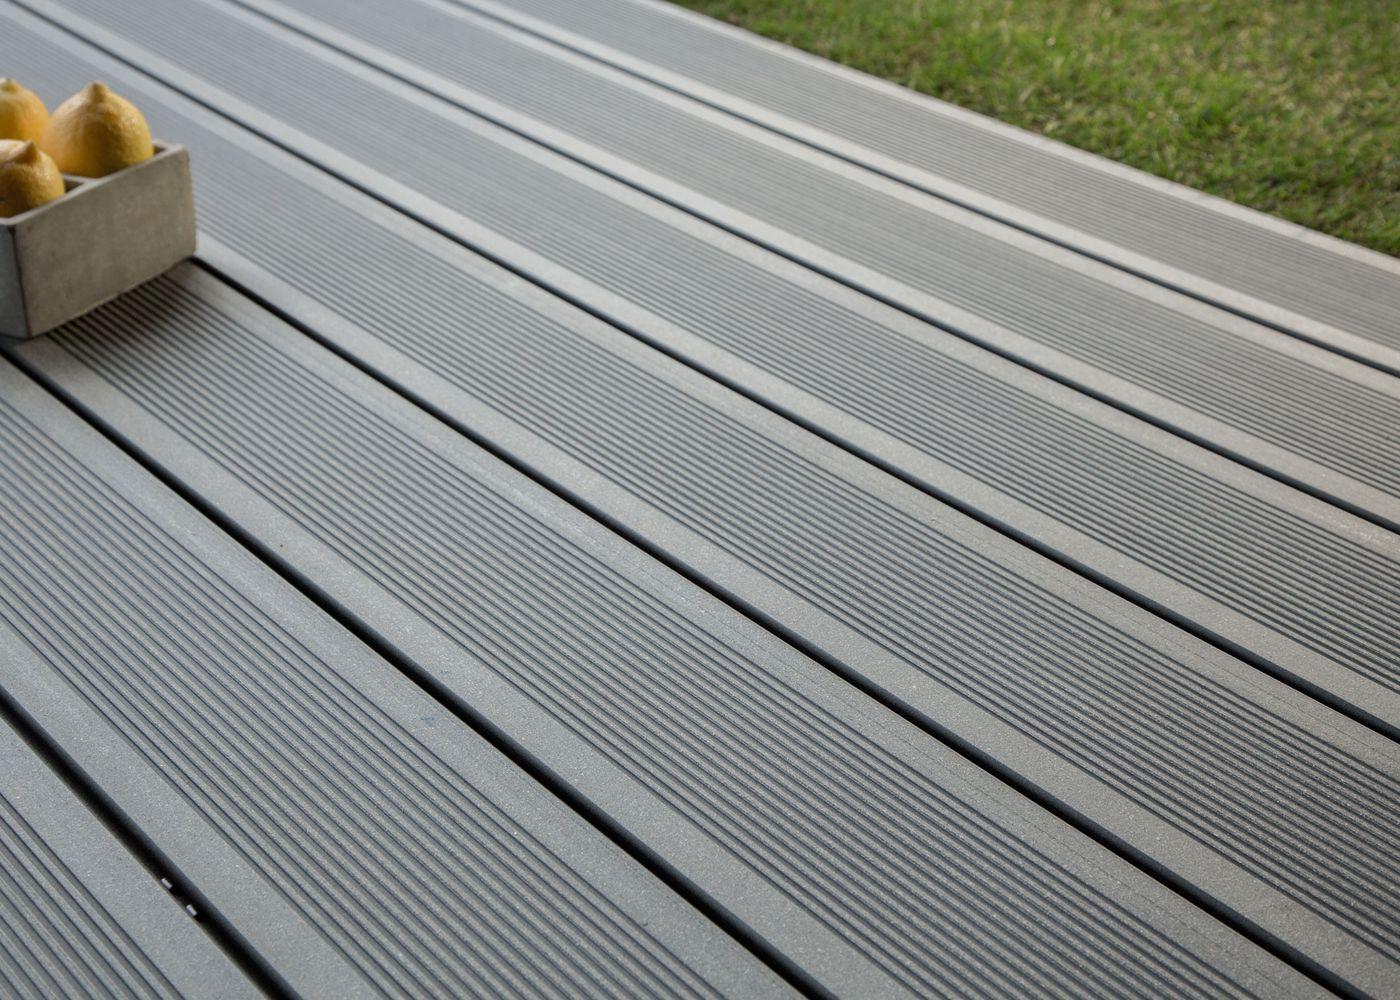 test lame de terrasse en composite comparatif avis le. Black Bedroom Furniture Sets. Home Design Ideas